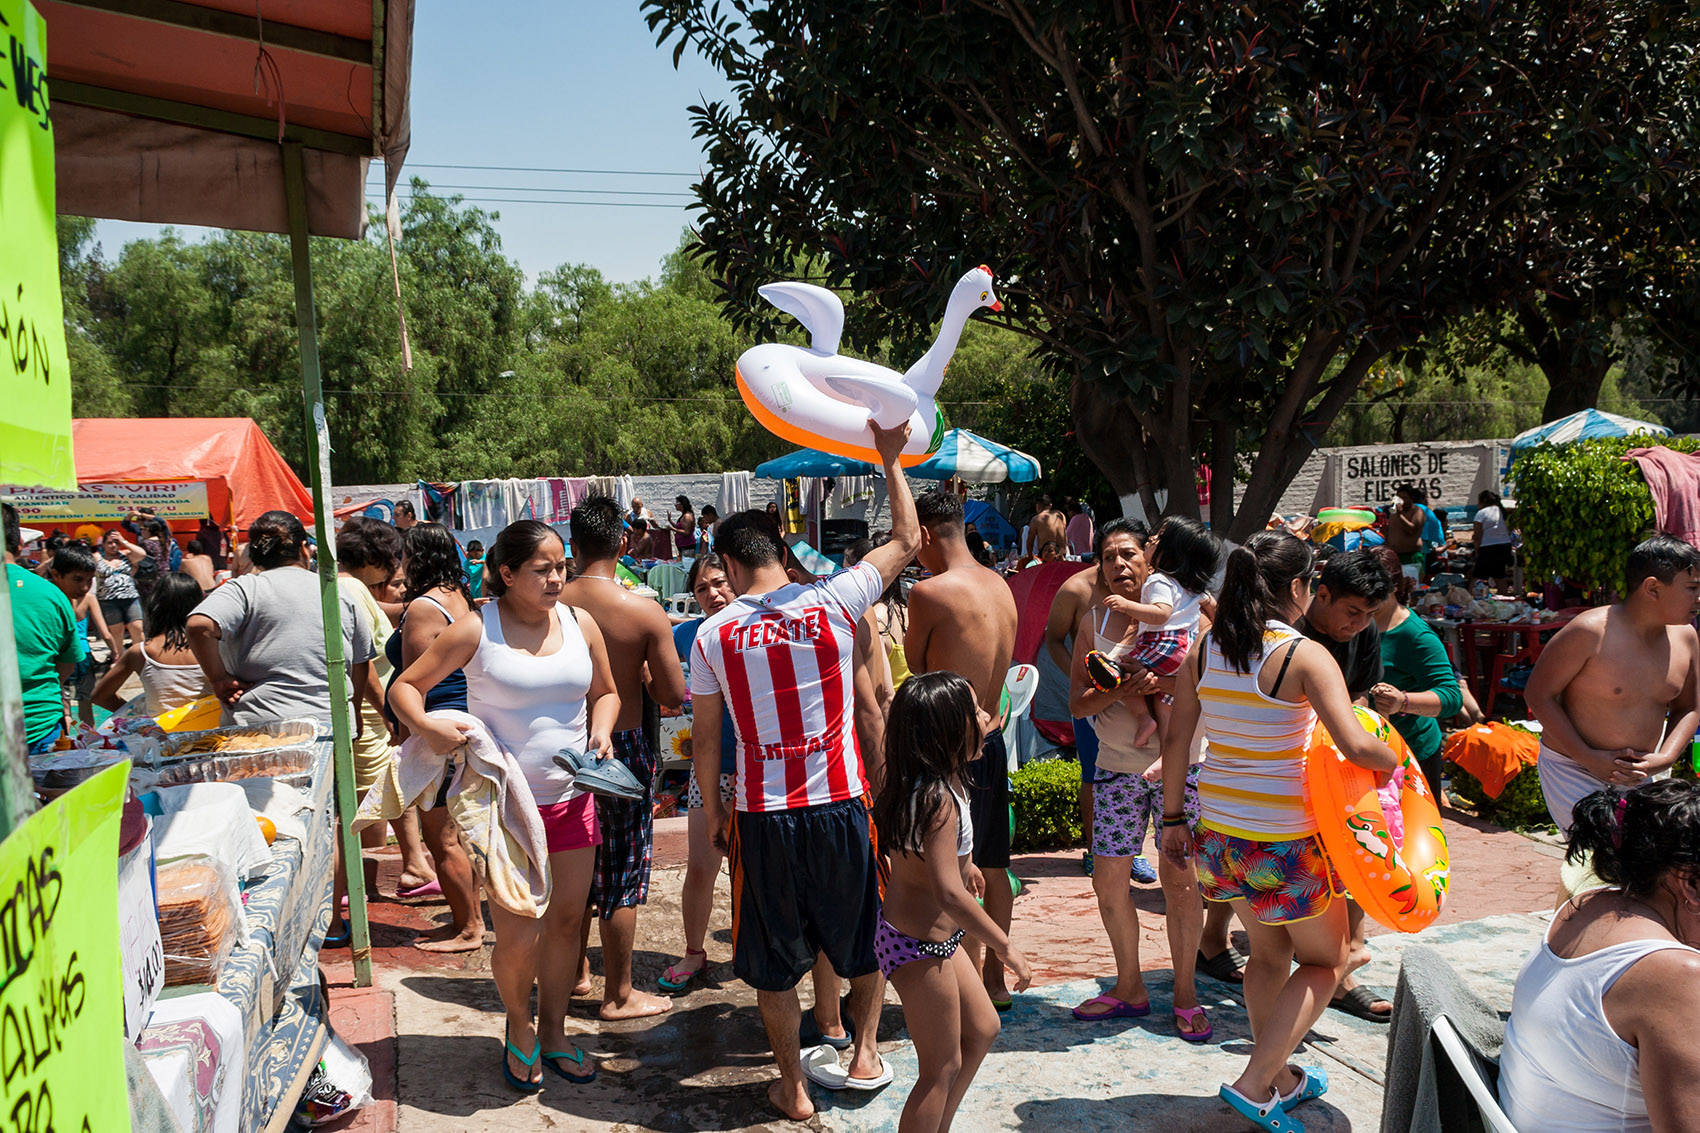 Elba Sábado de Gloria en Iztapalapa por Ockesaid a.k.a Joel Lugo - Street Photographer